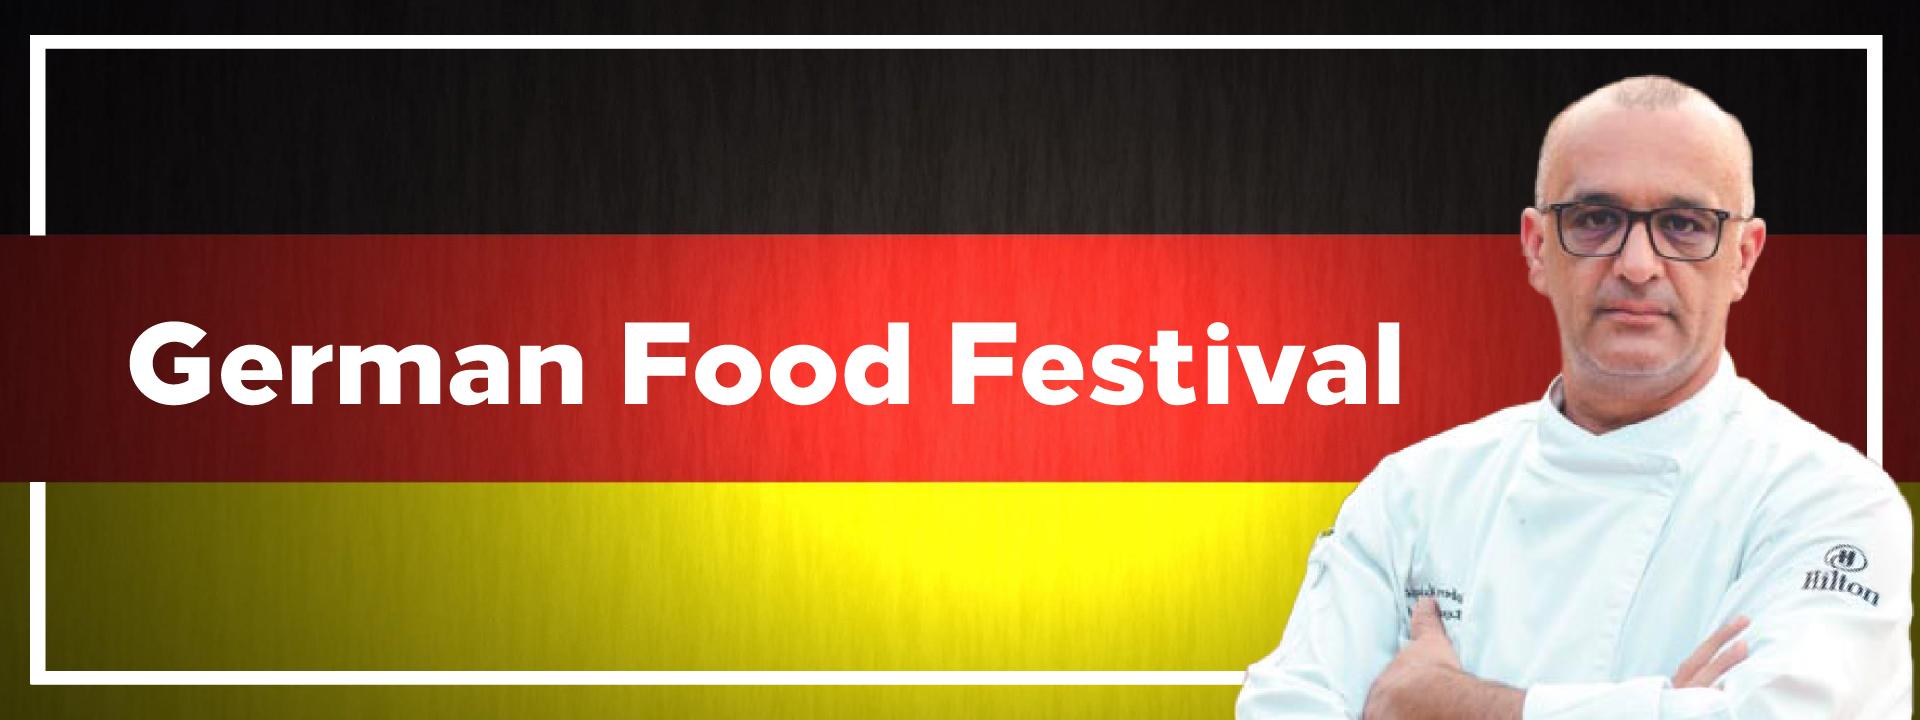 German Food Festival